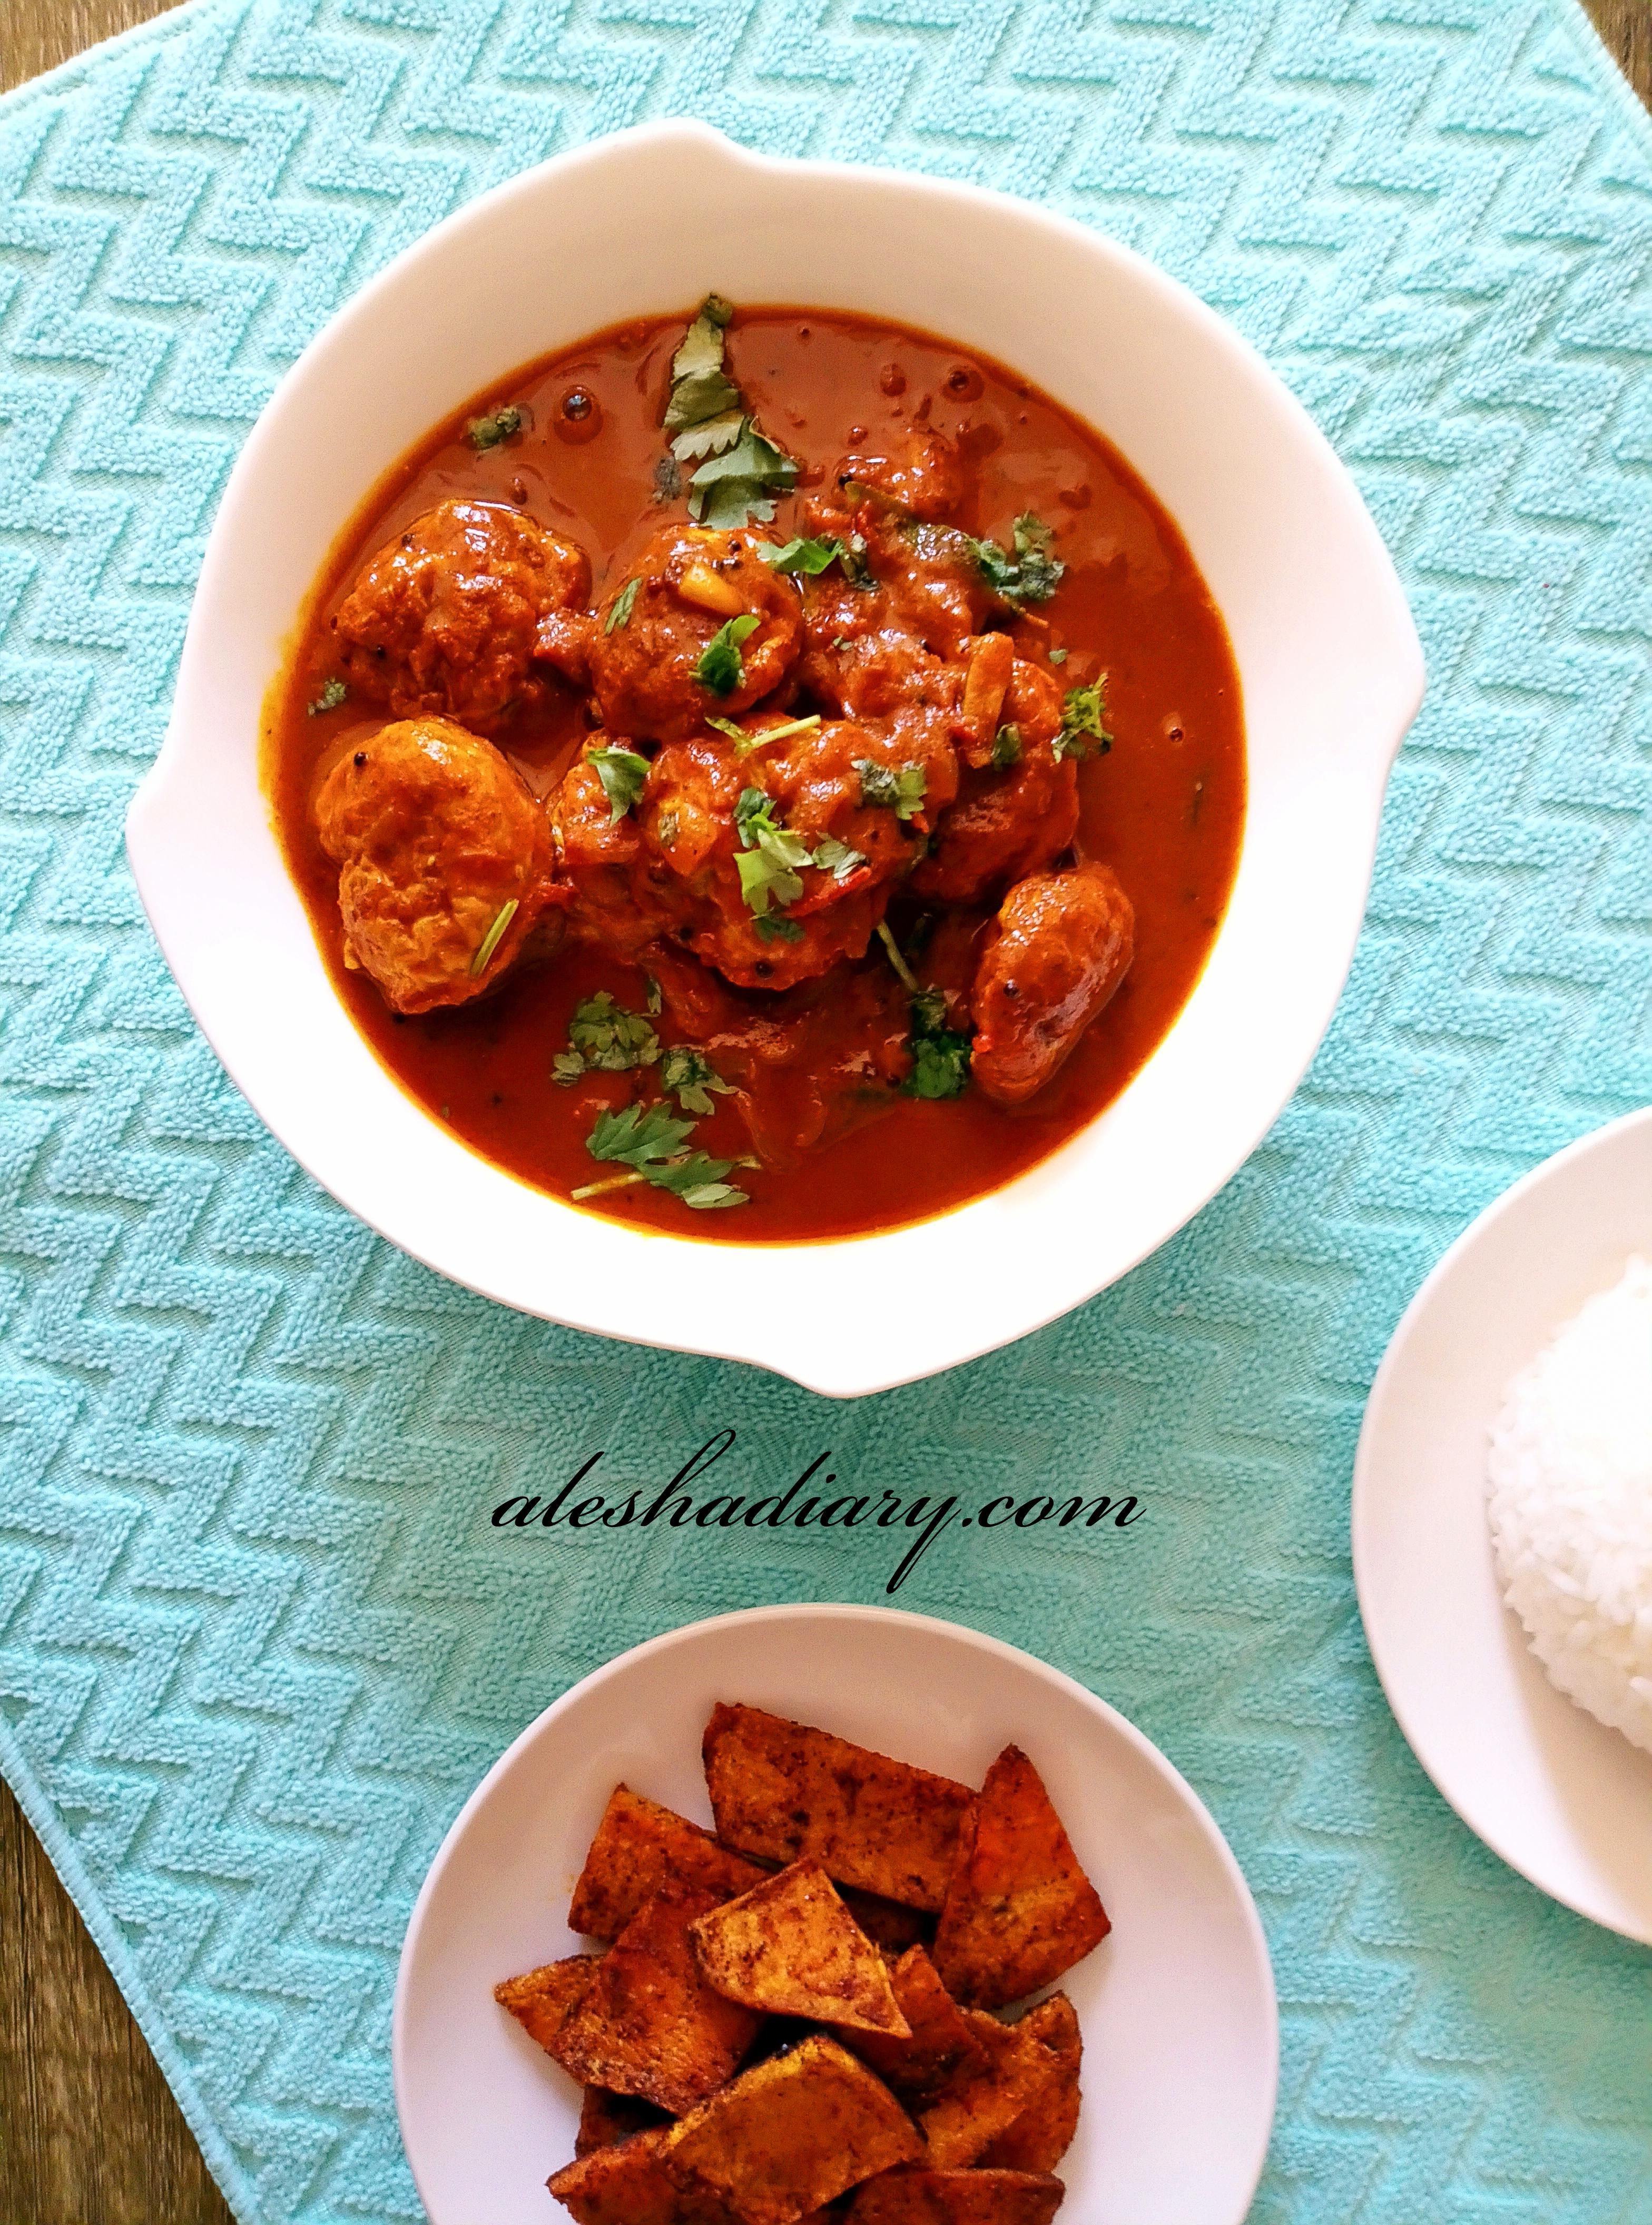 Muttai Urundai Puli Kuzhambu – Egg balls in tamarind gravy – முட்டை உருண்டை புளி குழம்பு